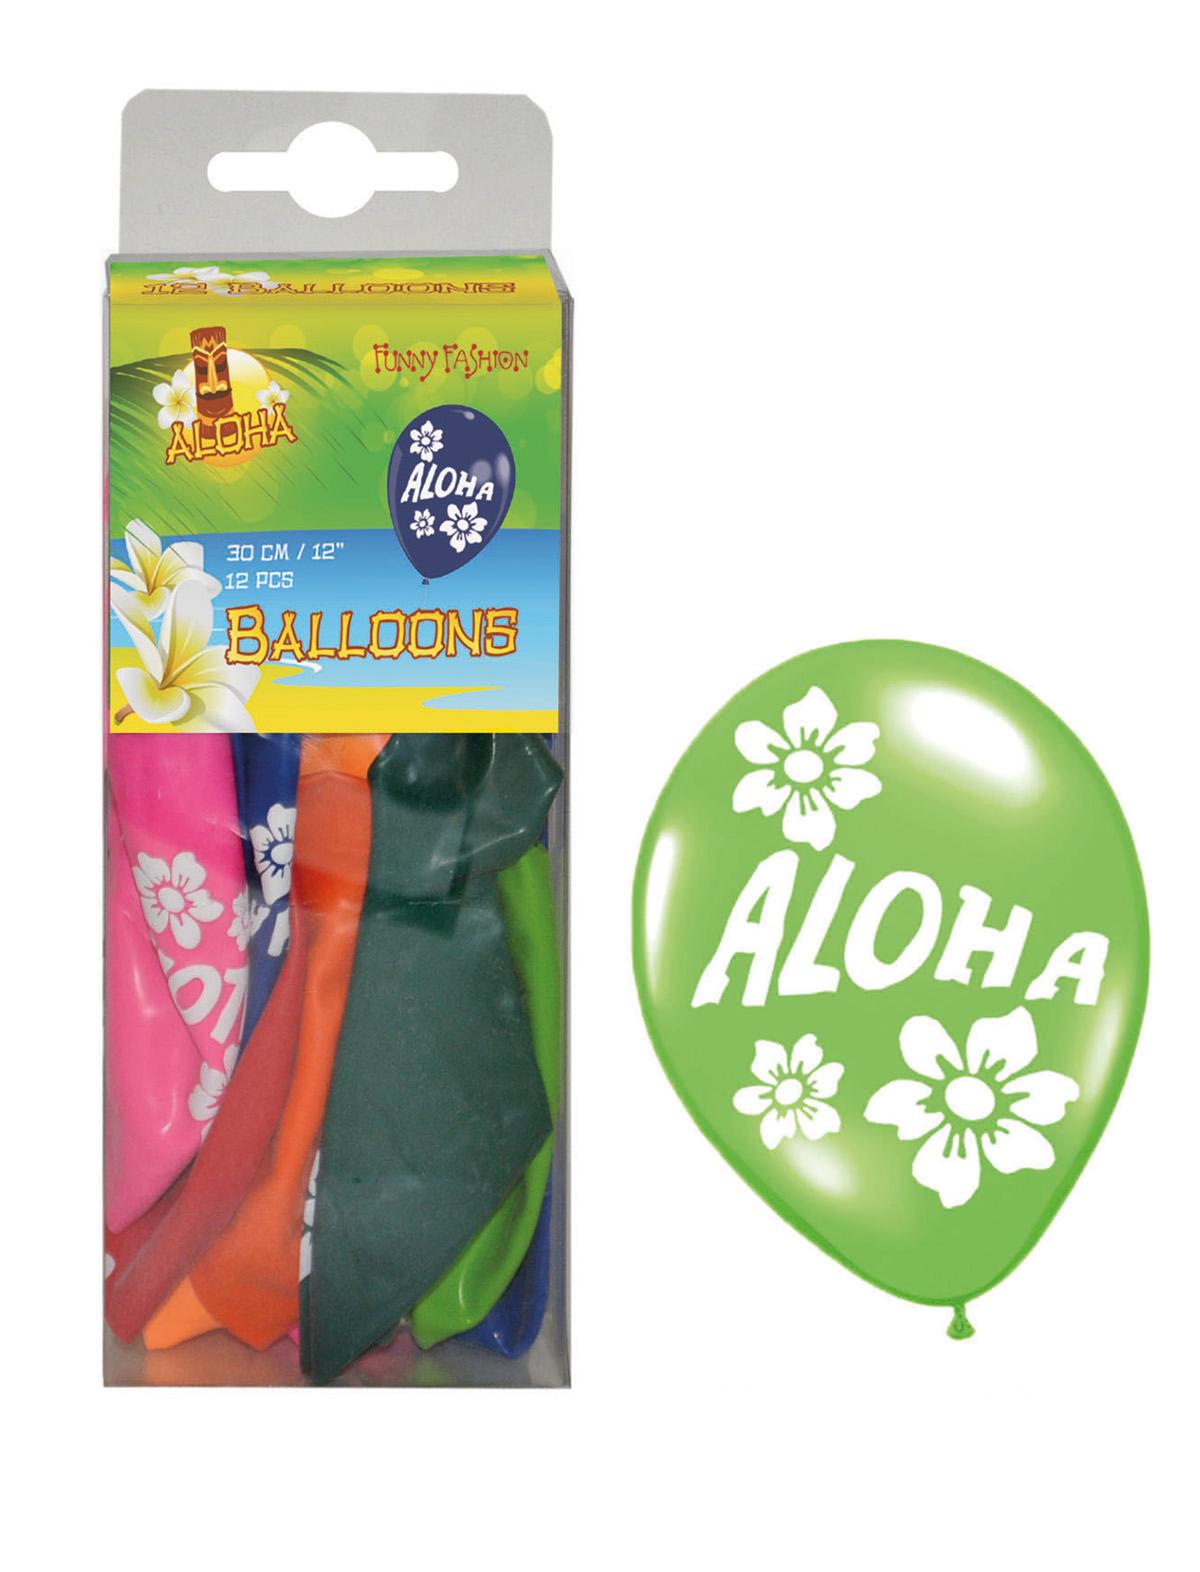 Luftballons Hawaii 12er